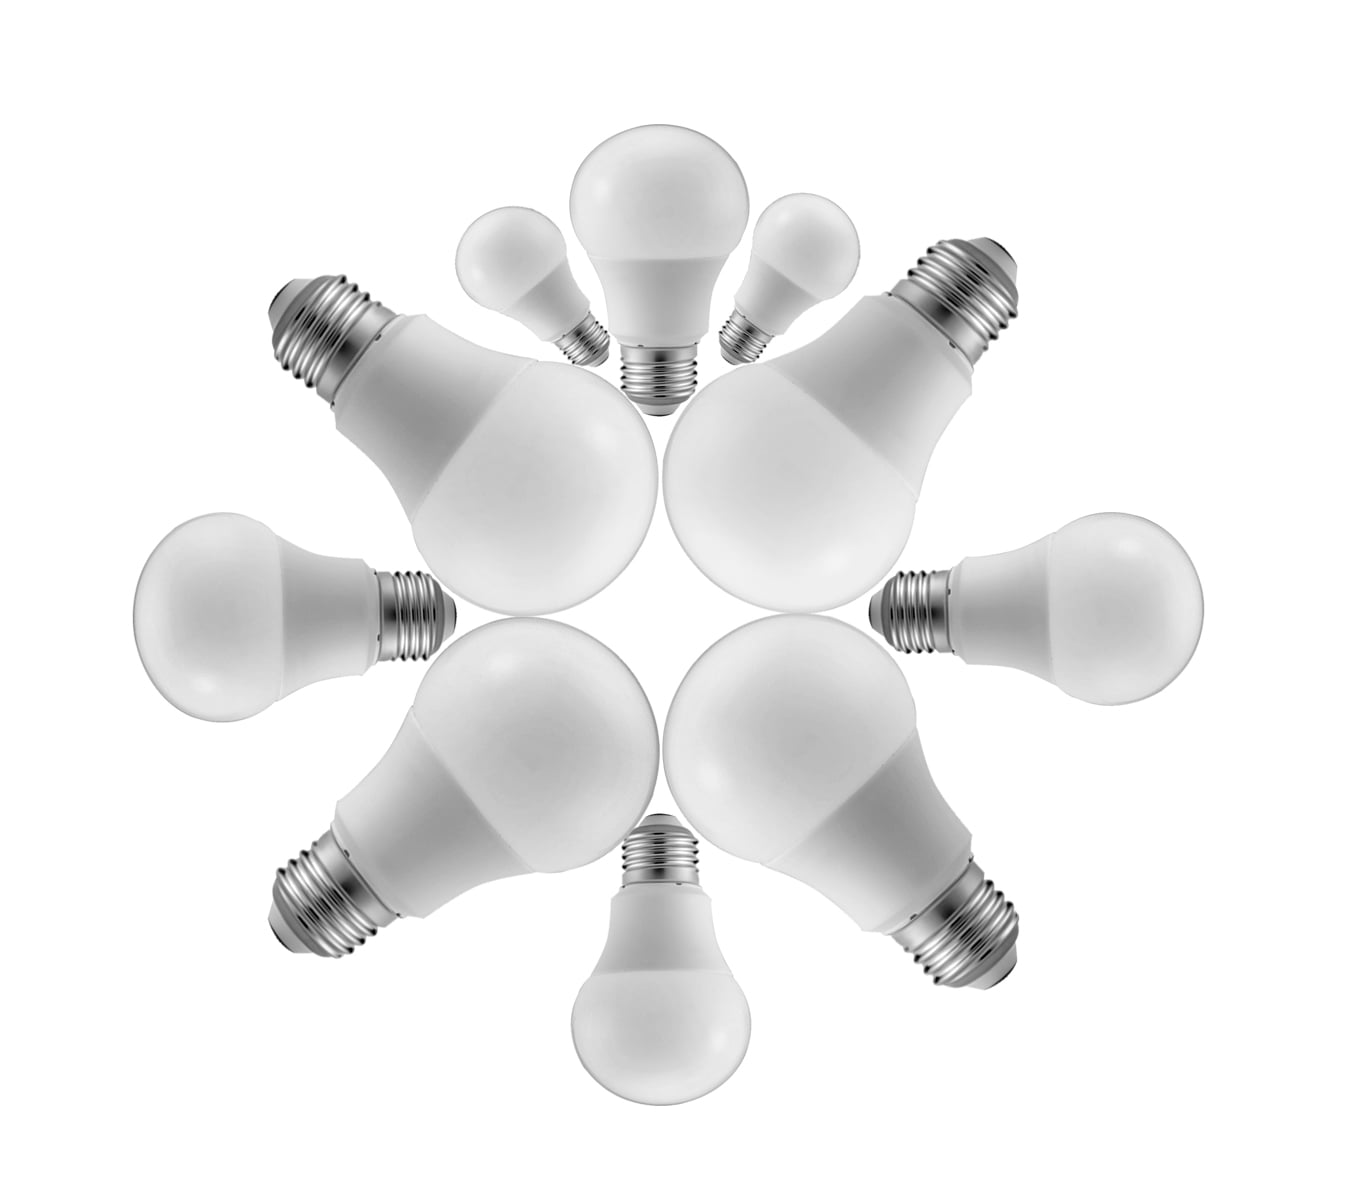 KIT COM 10 LAMPADAS LED BULBO 12W E-27 BIVOLT CERTIFICADA INMETRO